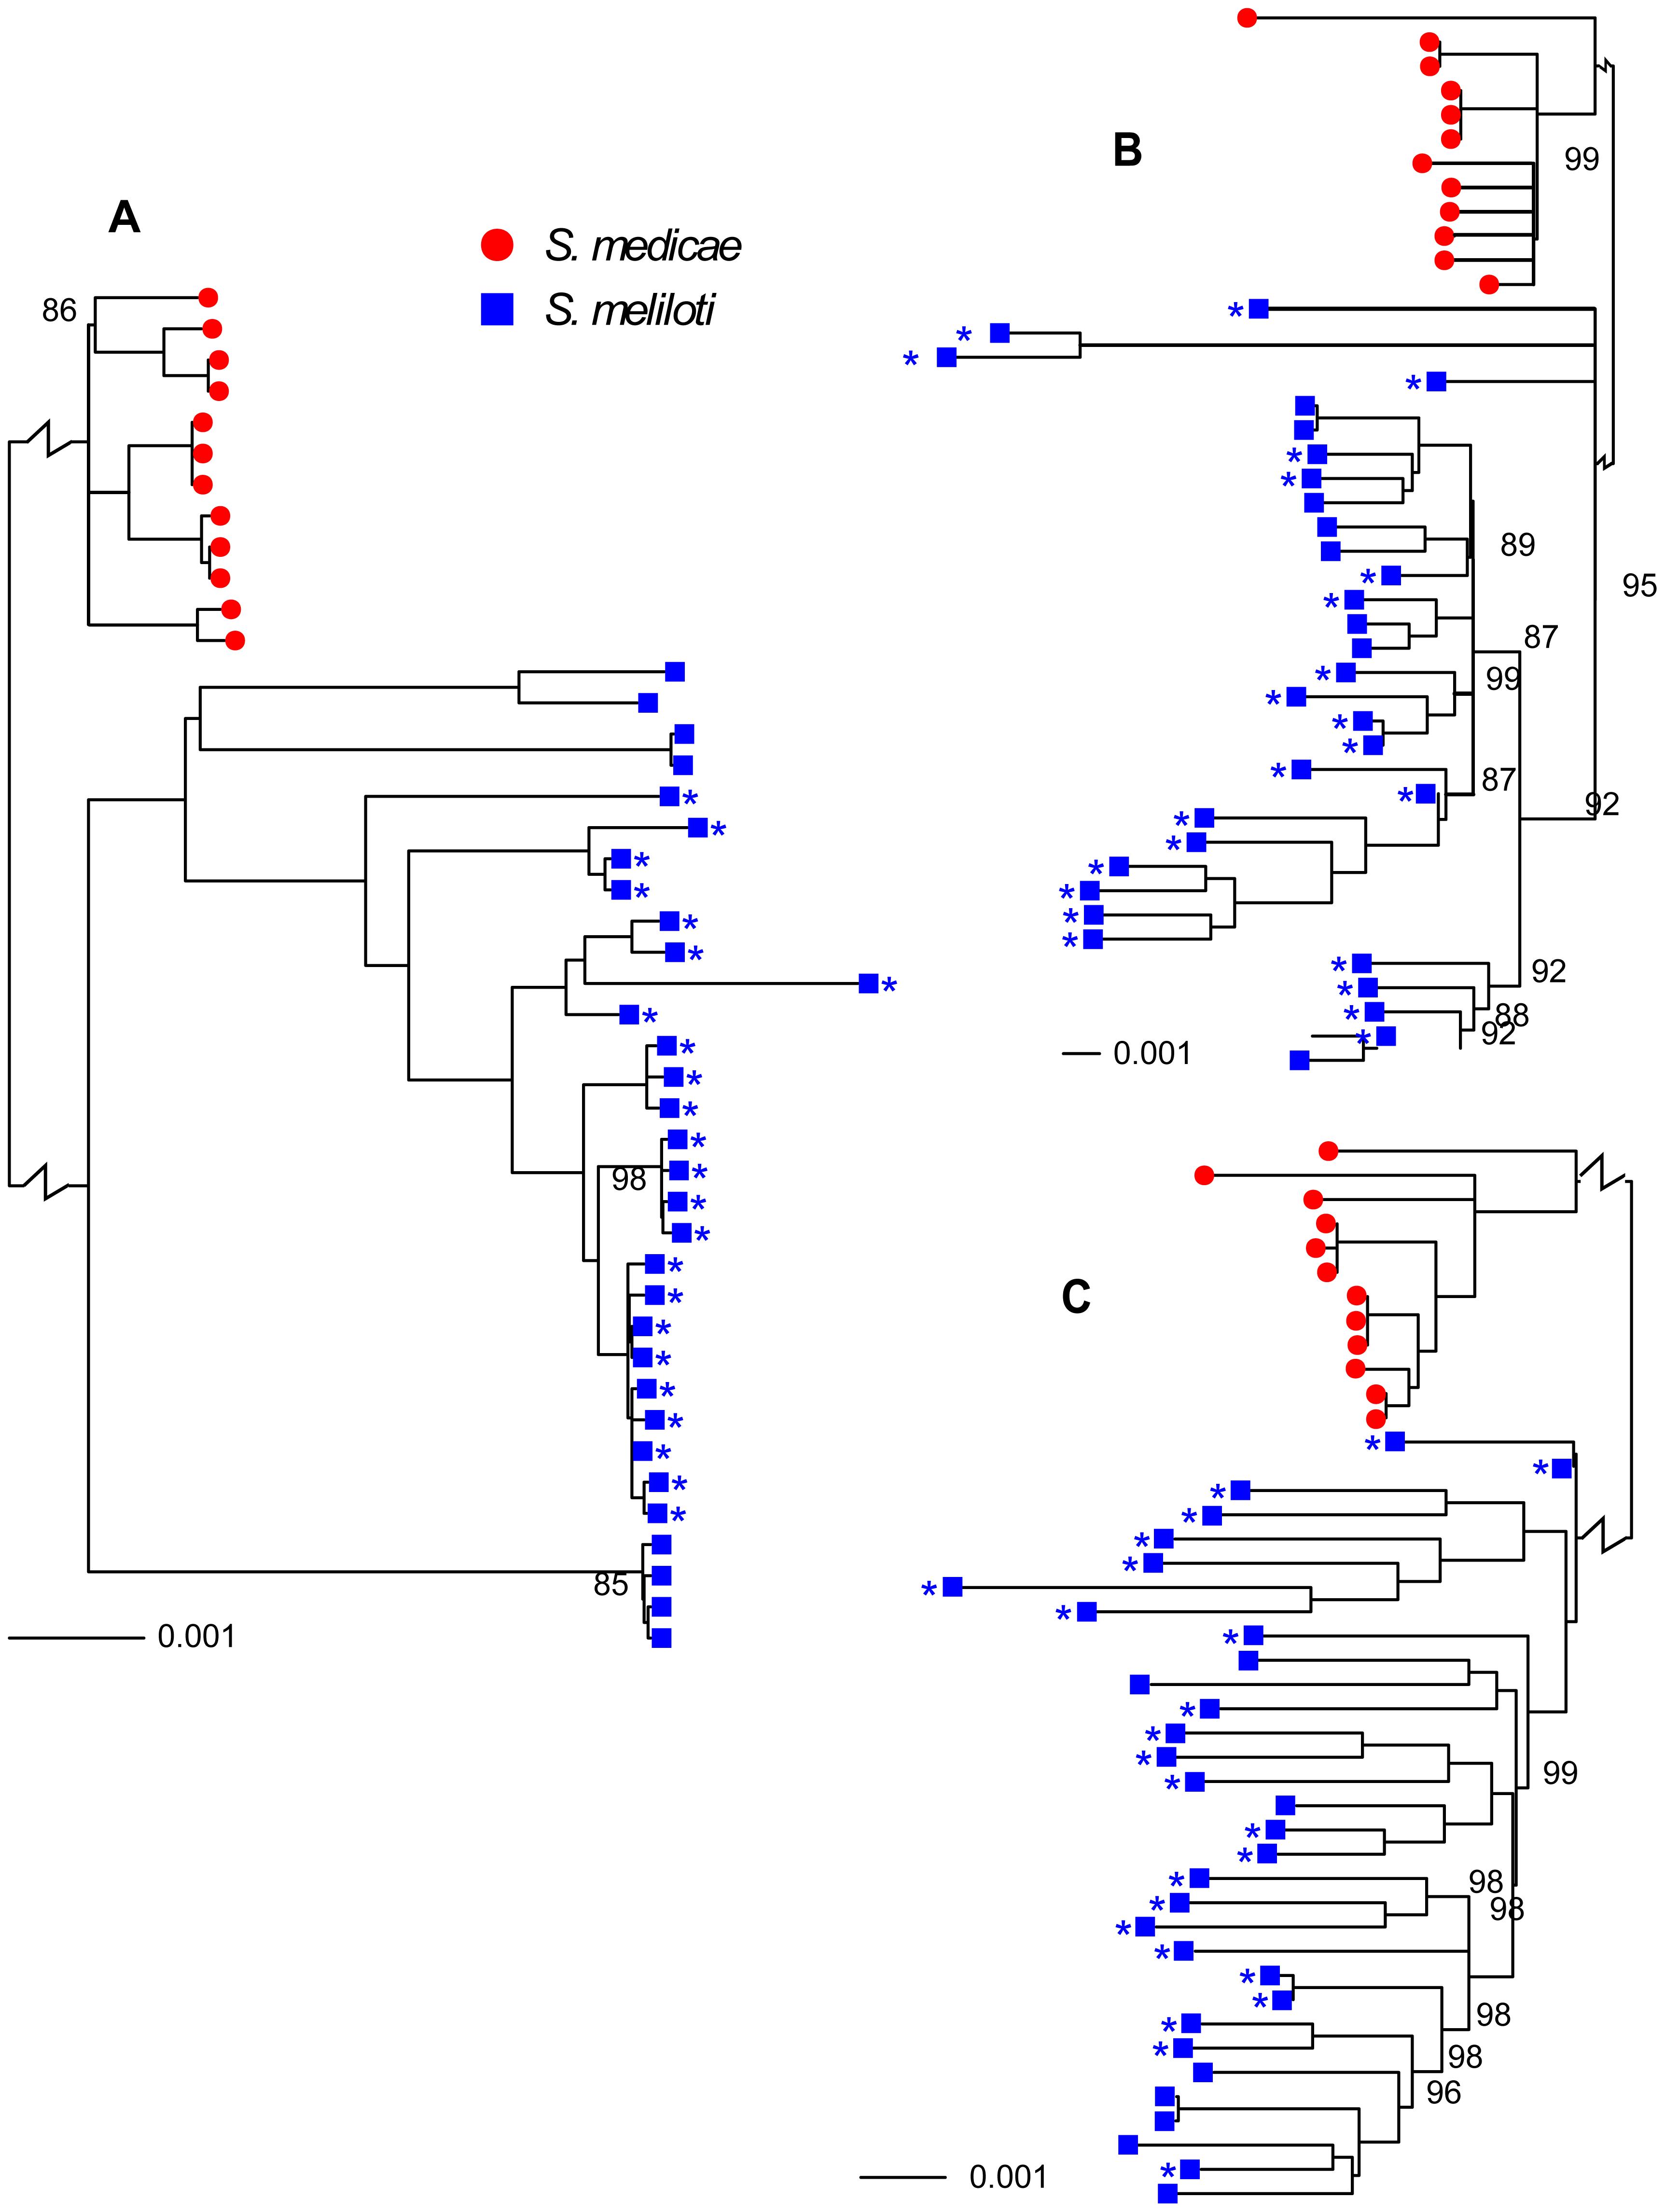 Neighbor-joining trees showing relationships among 32 <i>S. meliloti</i> (blue squares) and 12 <i>S. medicae</i> (red circles).